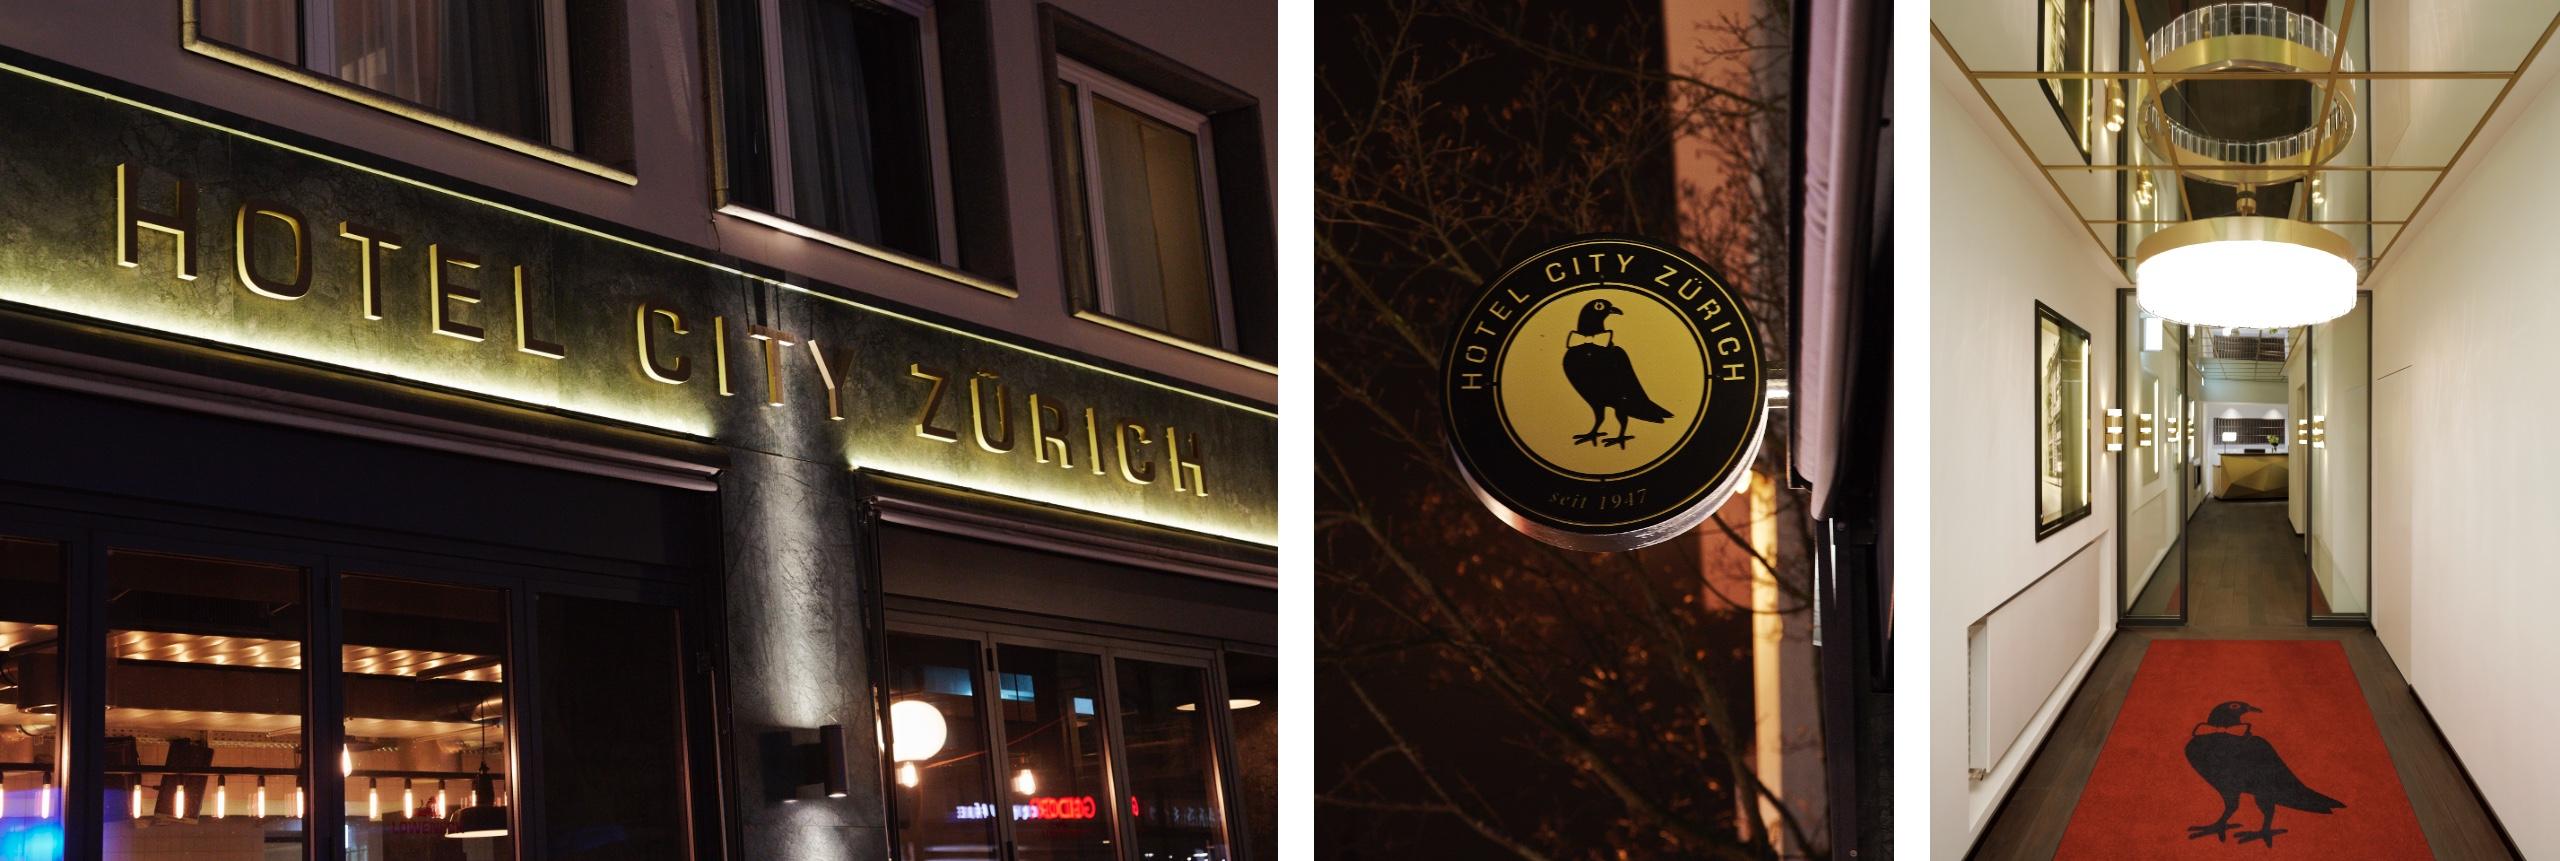 Hotel City Zürich Lobby, Logo, Fassade